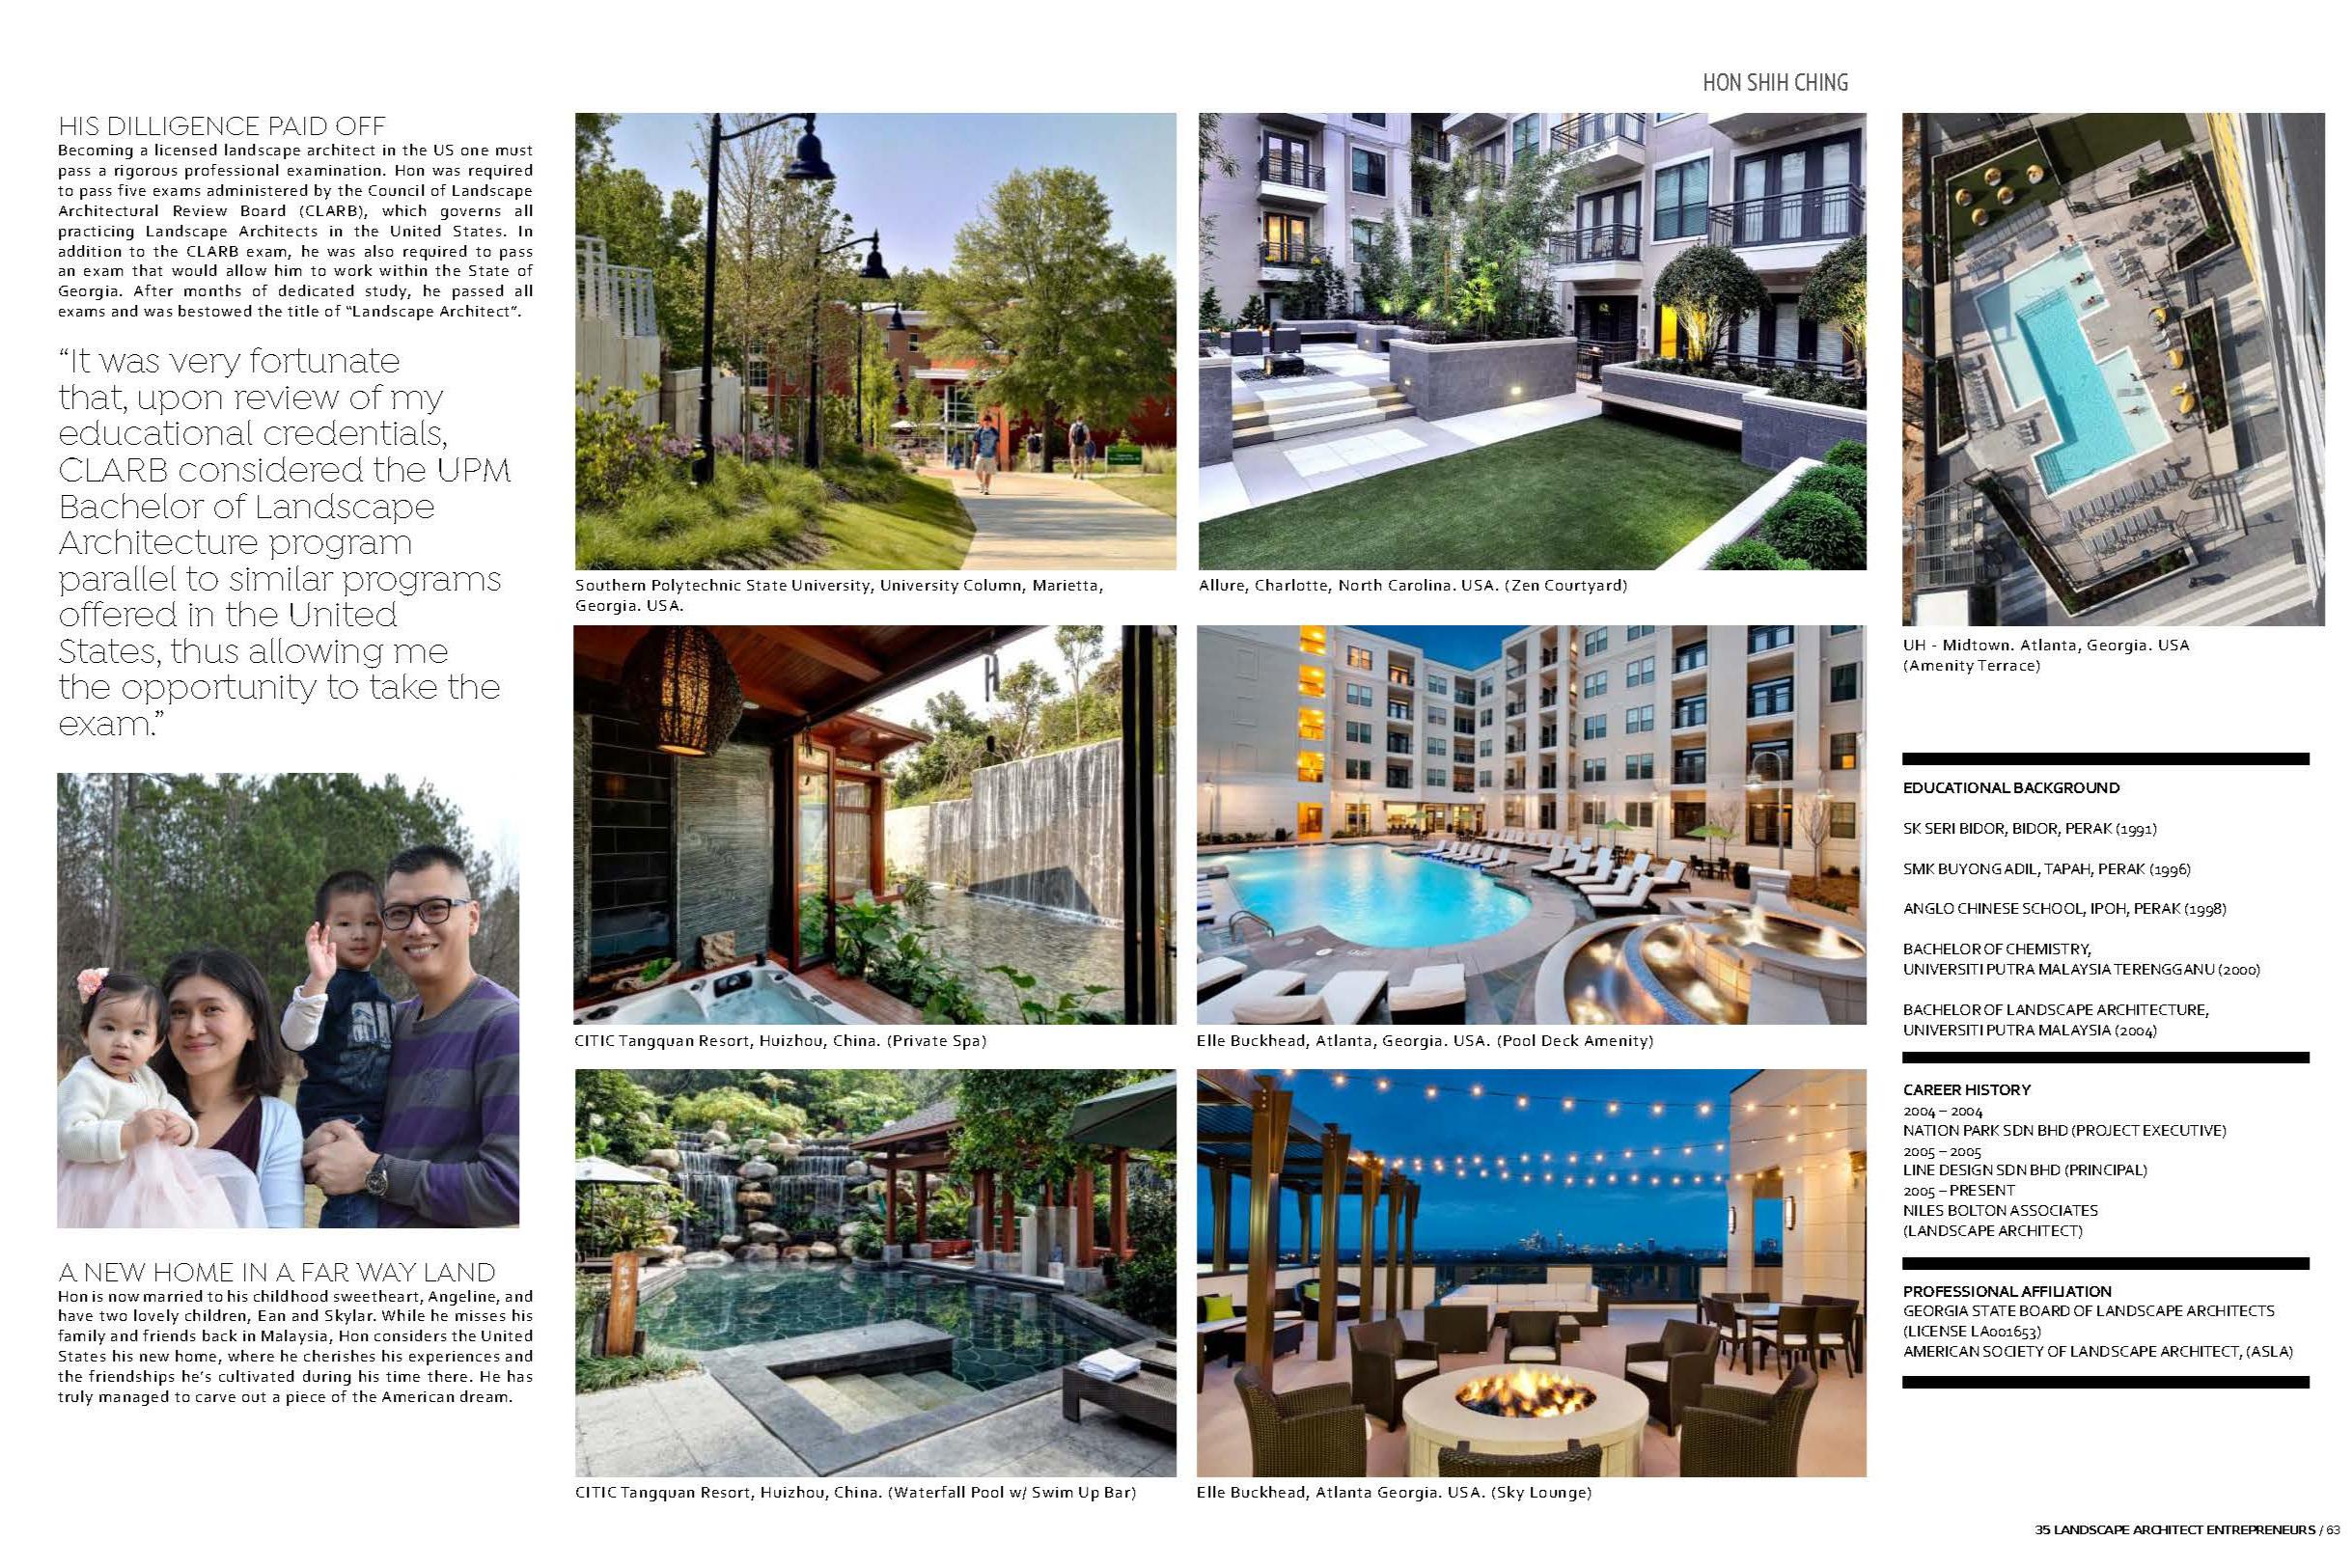 HON_Landscape+Architect+Entrepreneurs+Article+3.jpg